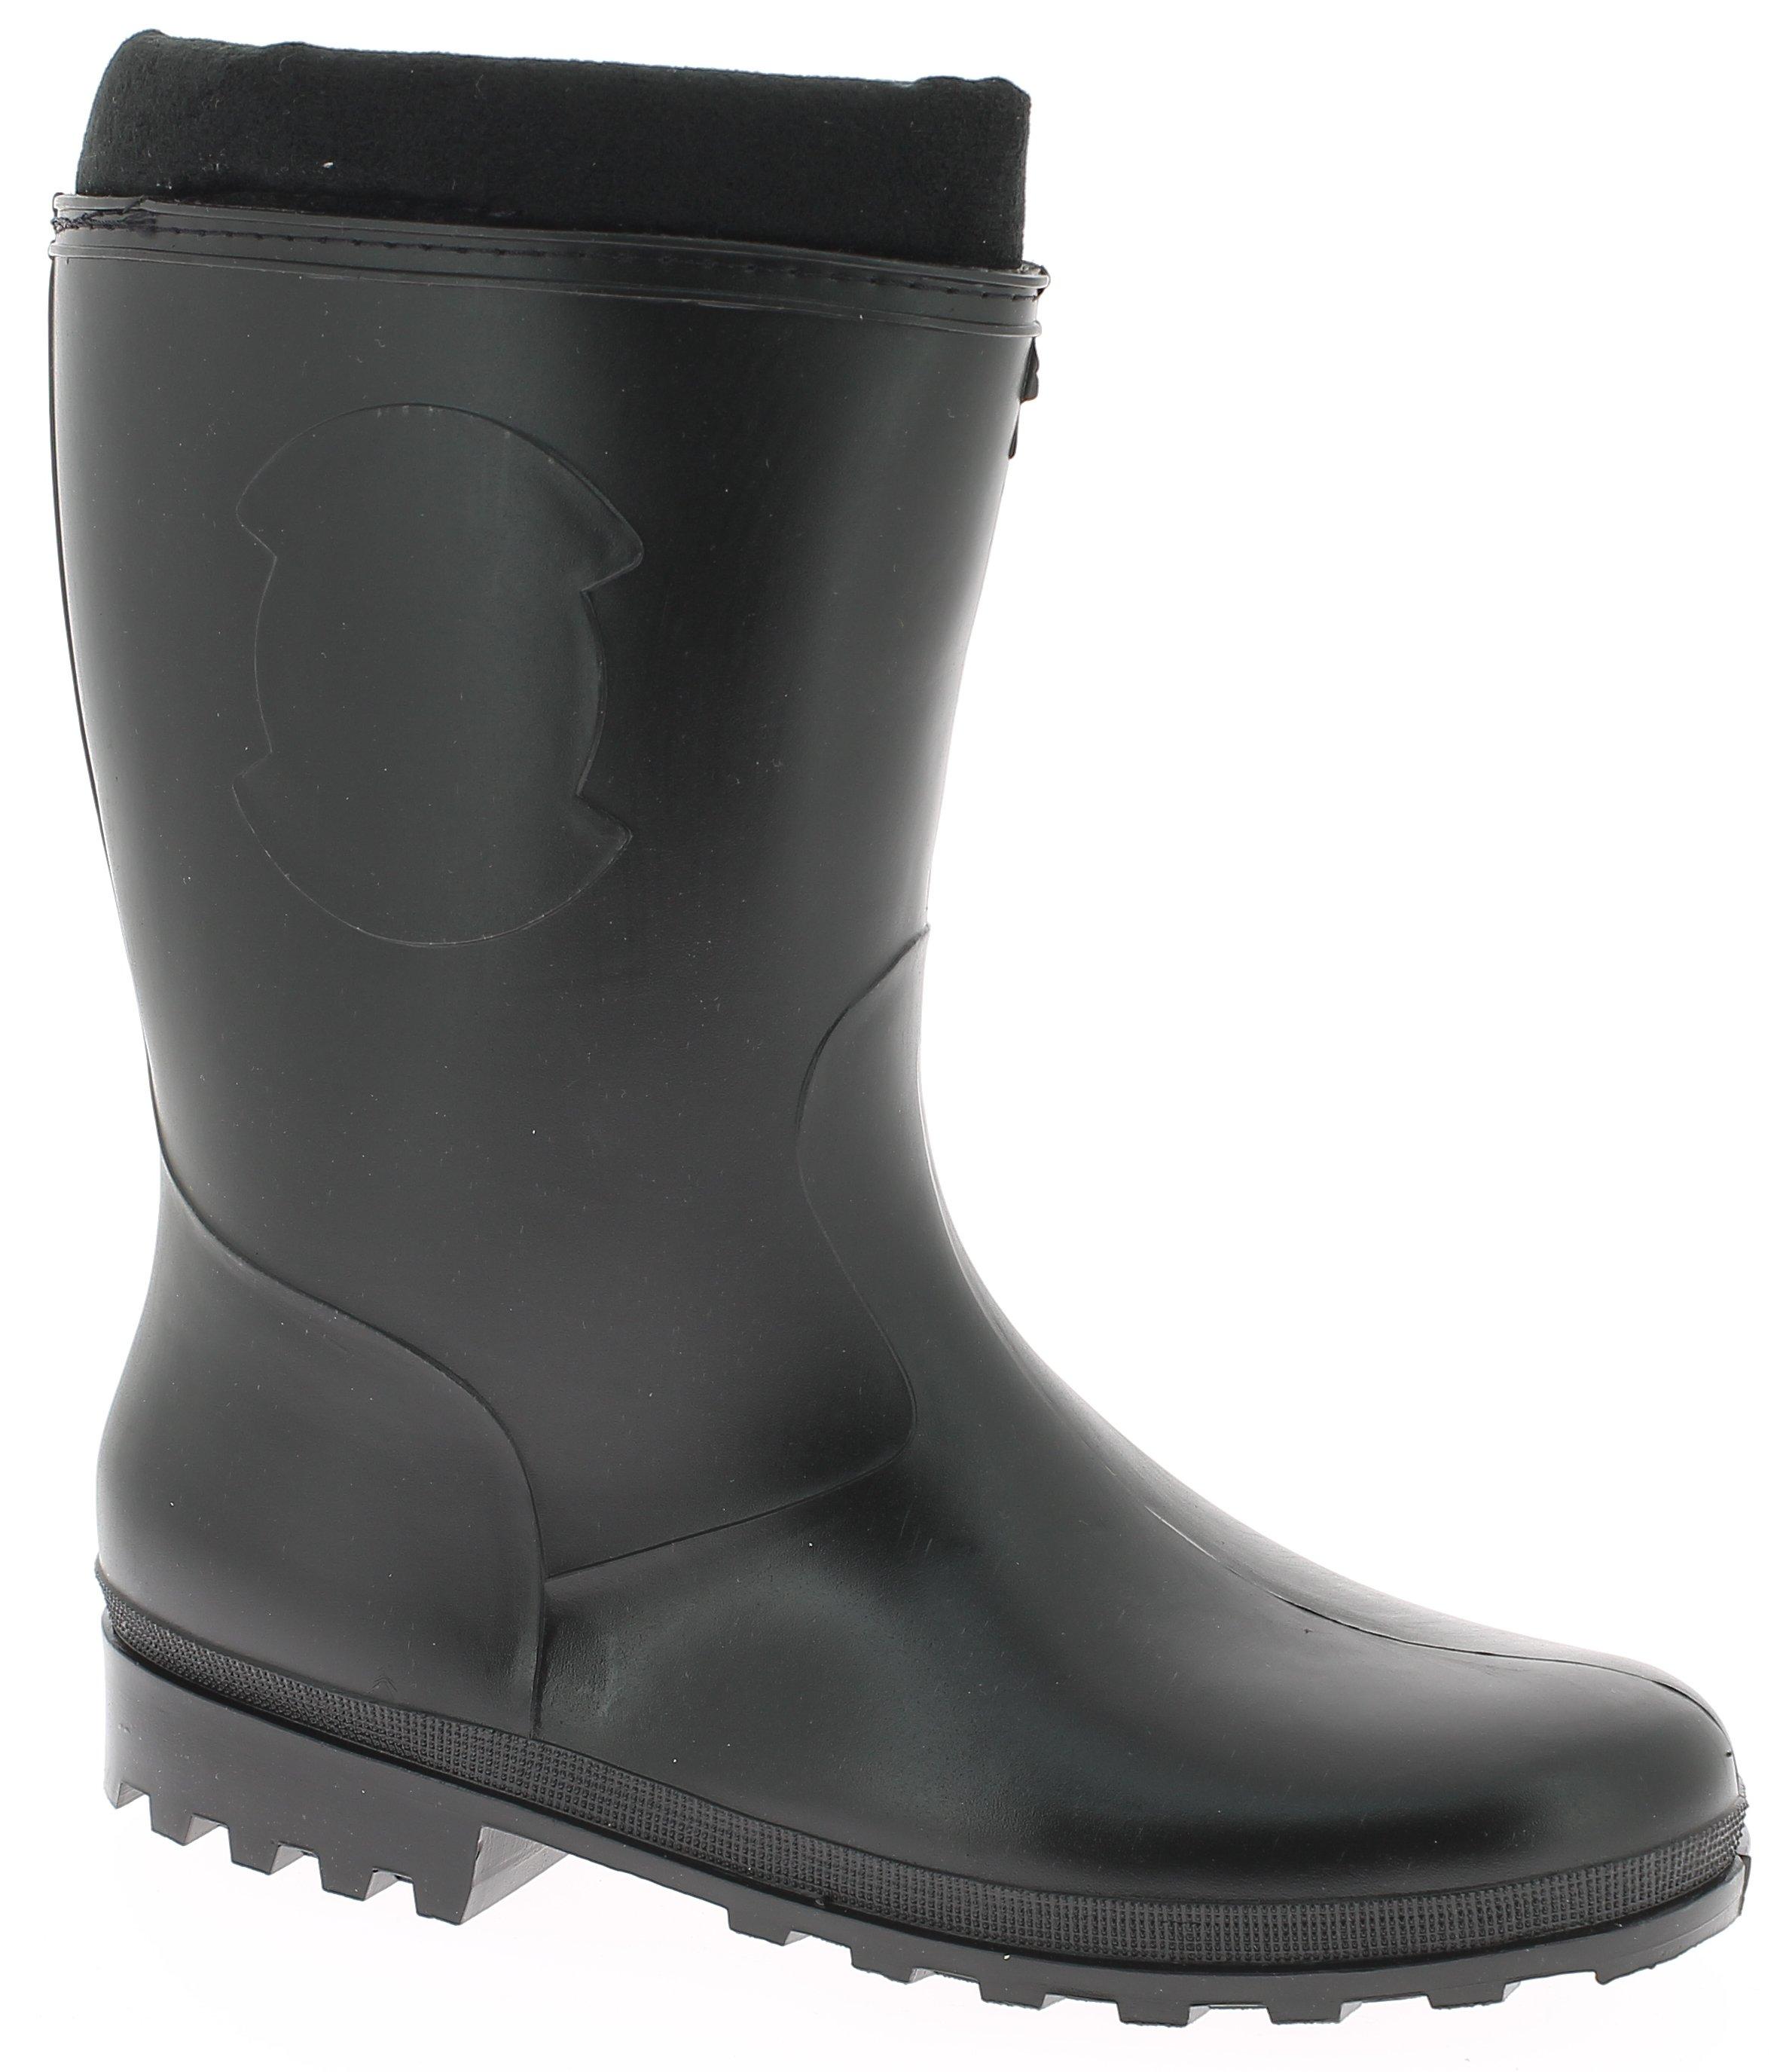 IQSHOES Γαλότσα Γυναικεία 338-3 Μαύρο - IqShoes - 338-3 black black 35/1/15/29 παπούτσια  προσφορεσ